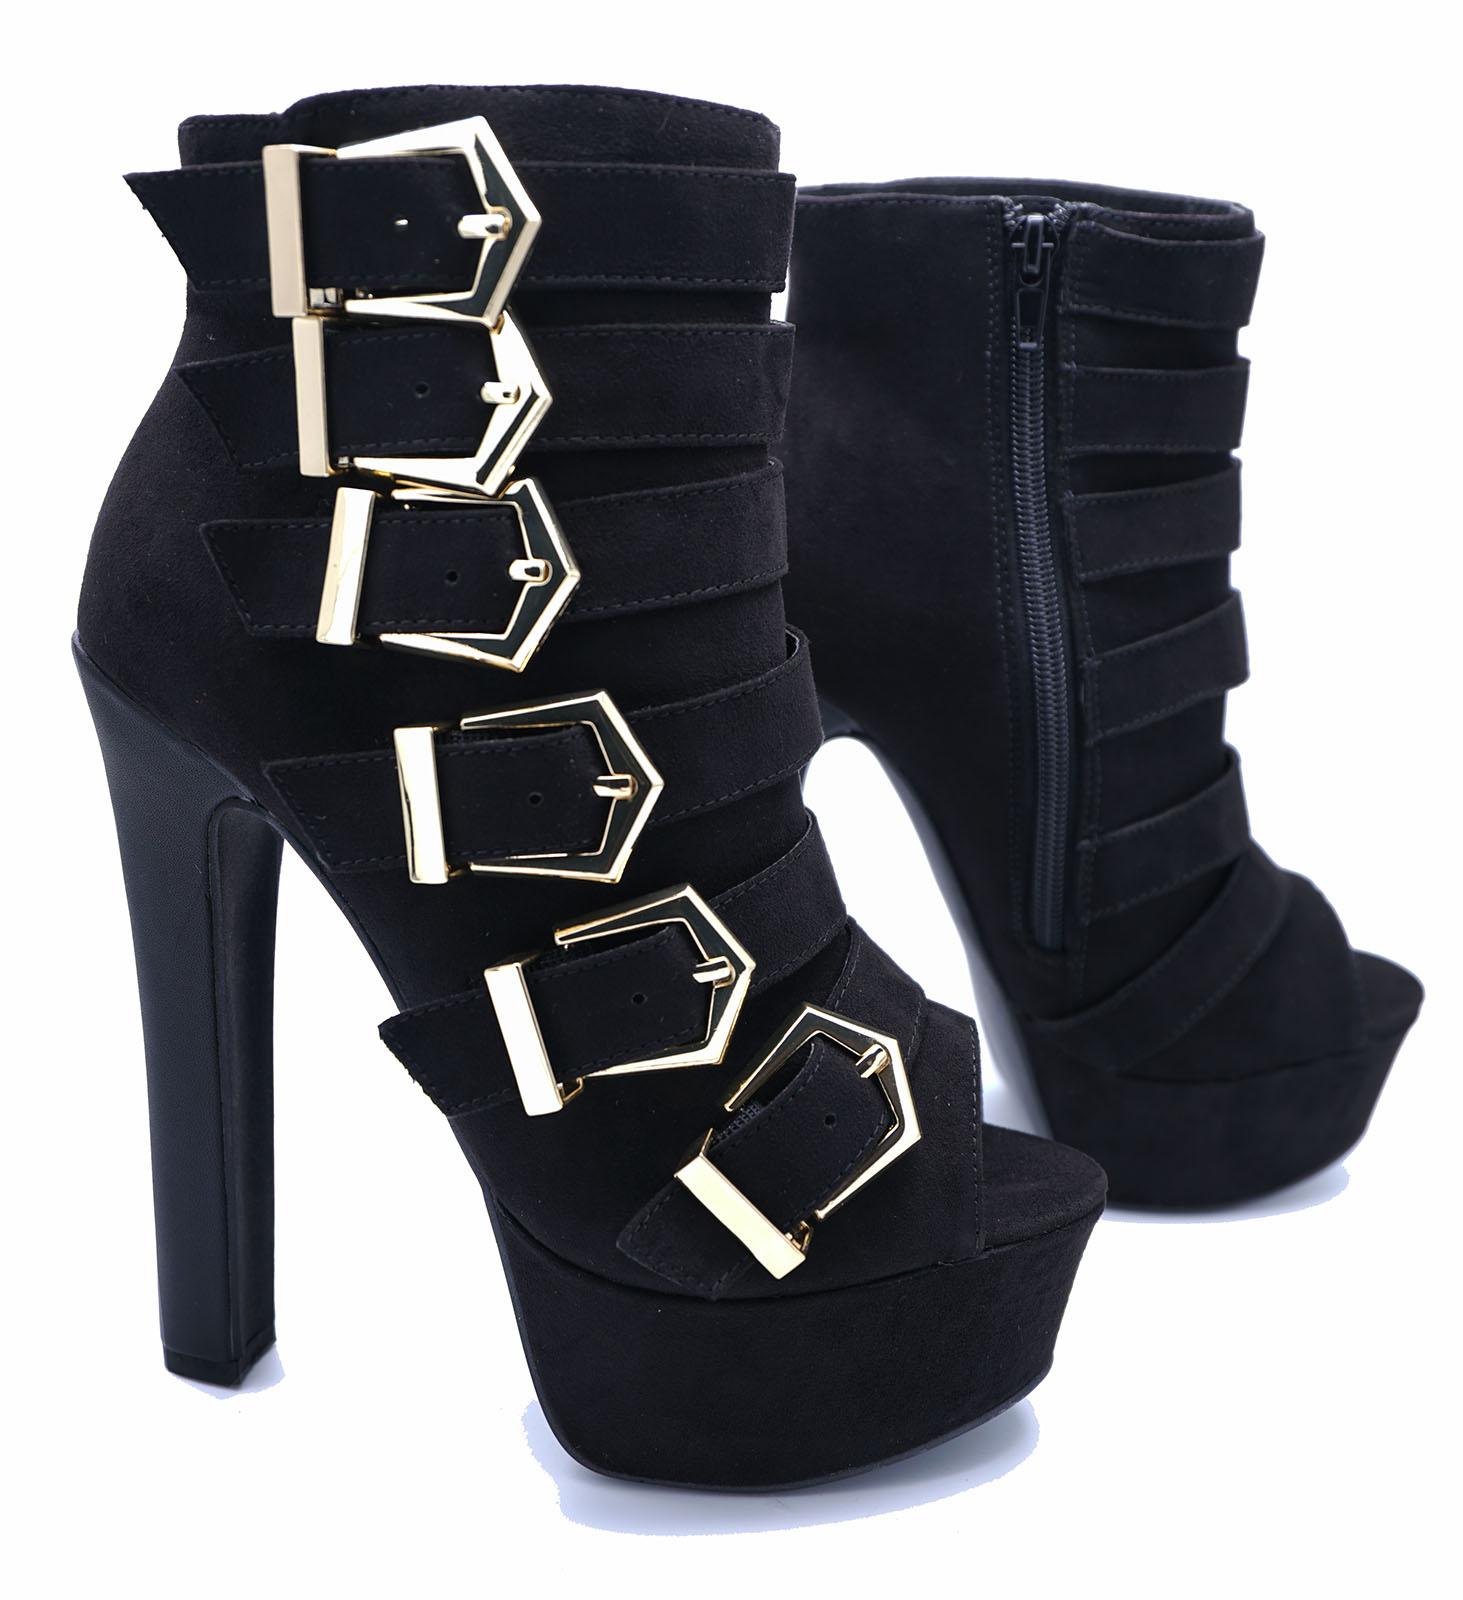 LADIES-BLACK-ZIP-UP-PLATFORM-PEEP-TOE-BUCKLE-ANKLE-CALF-HIGH-HEEL-BOOTS-SIZES-3 thumbnail 27